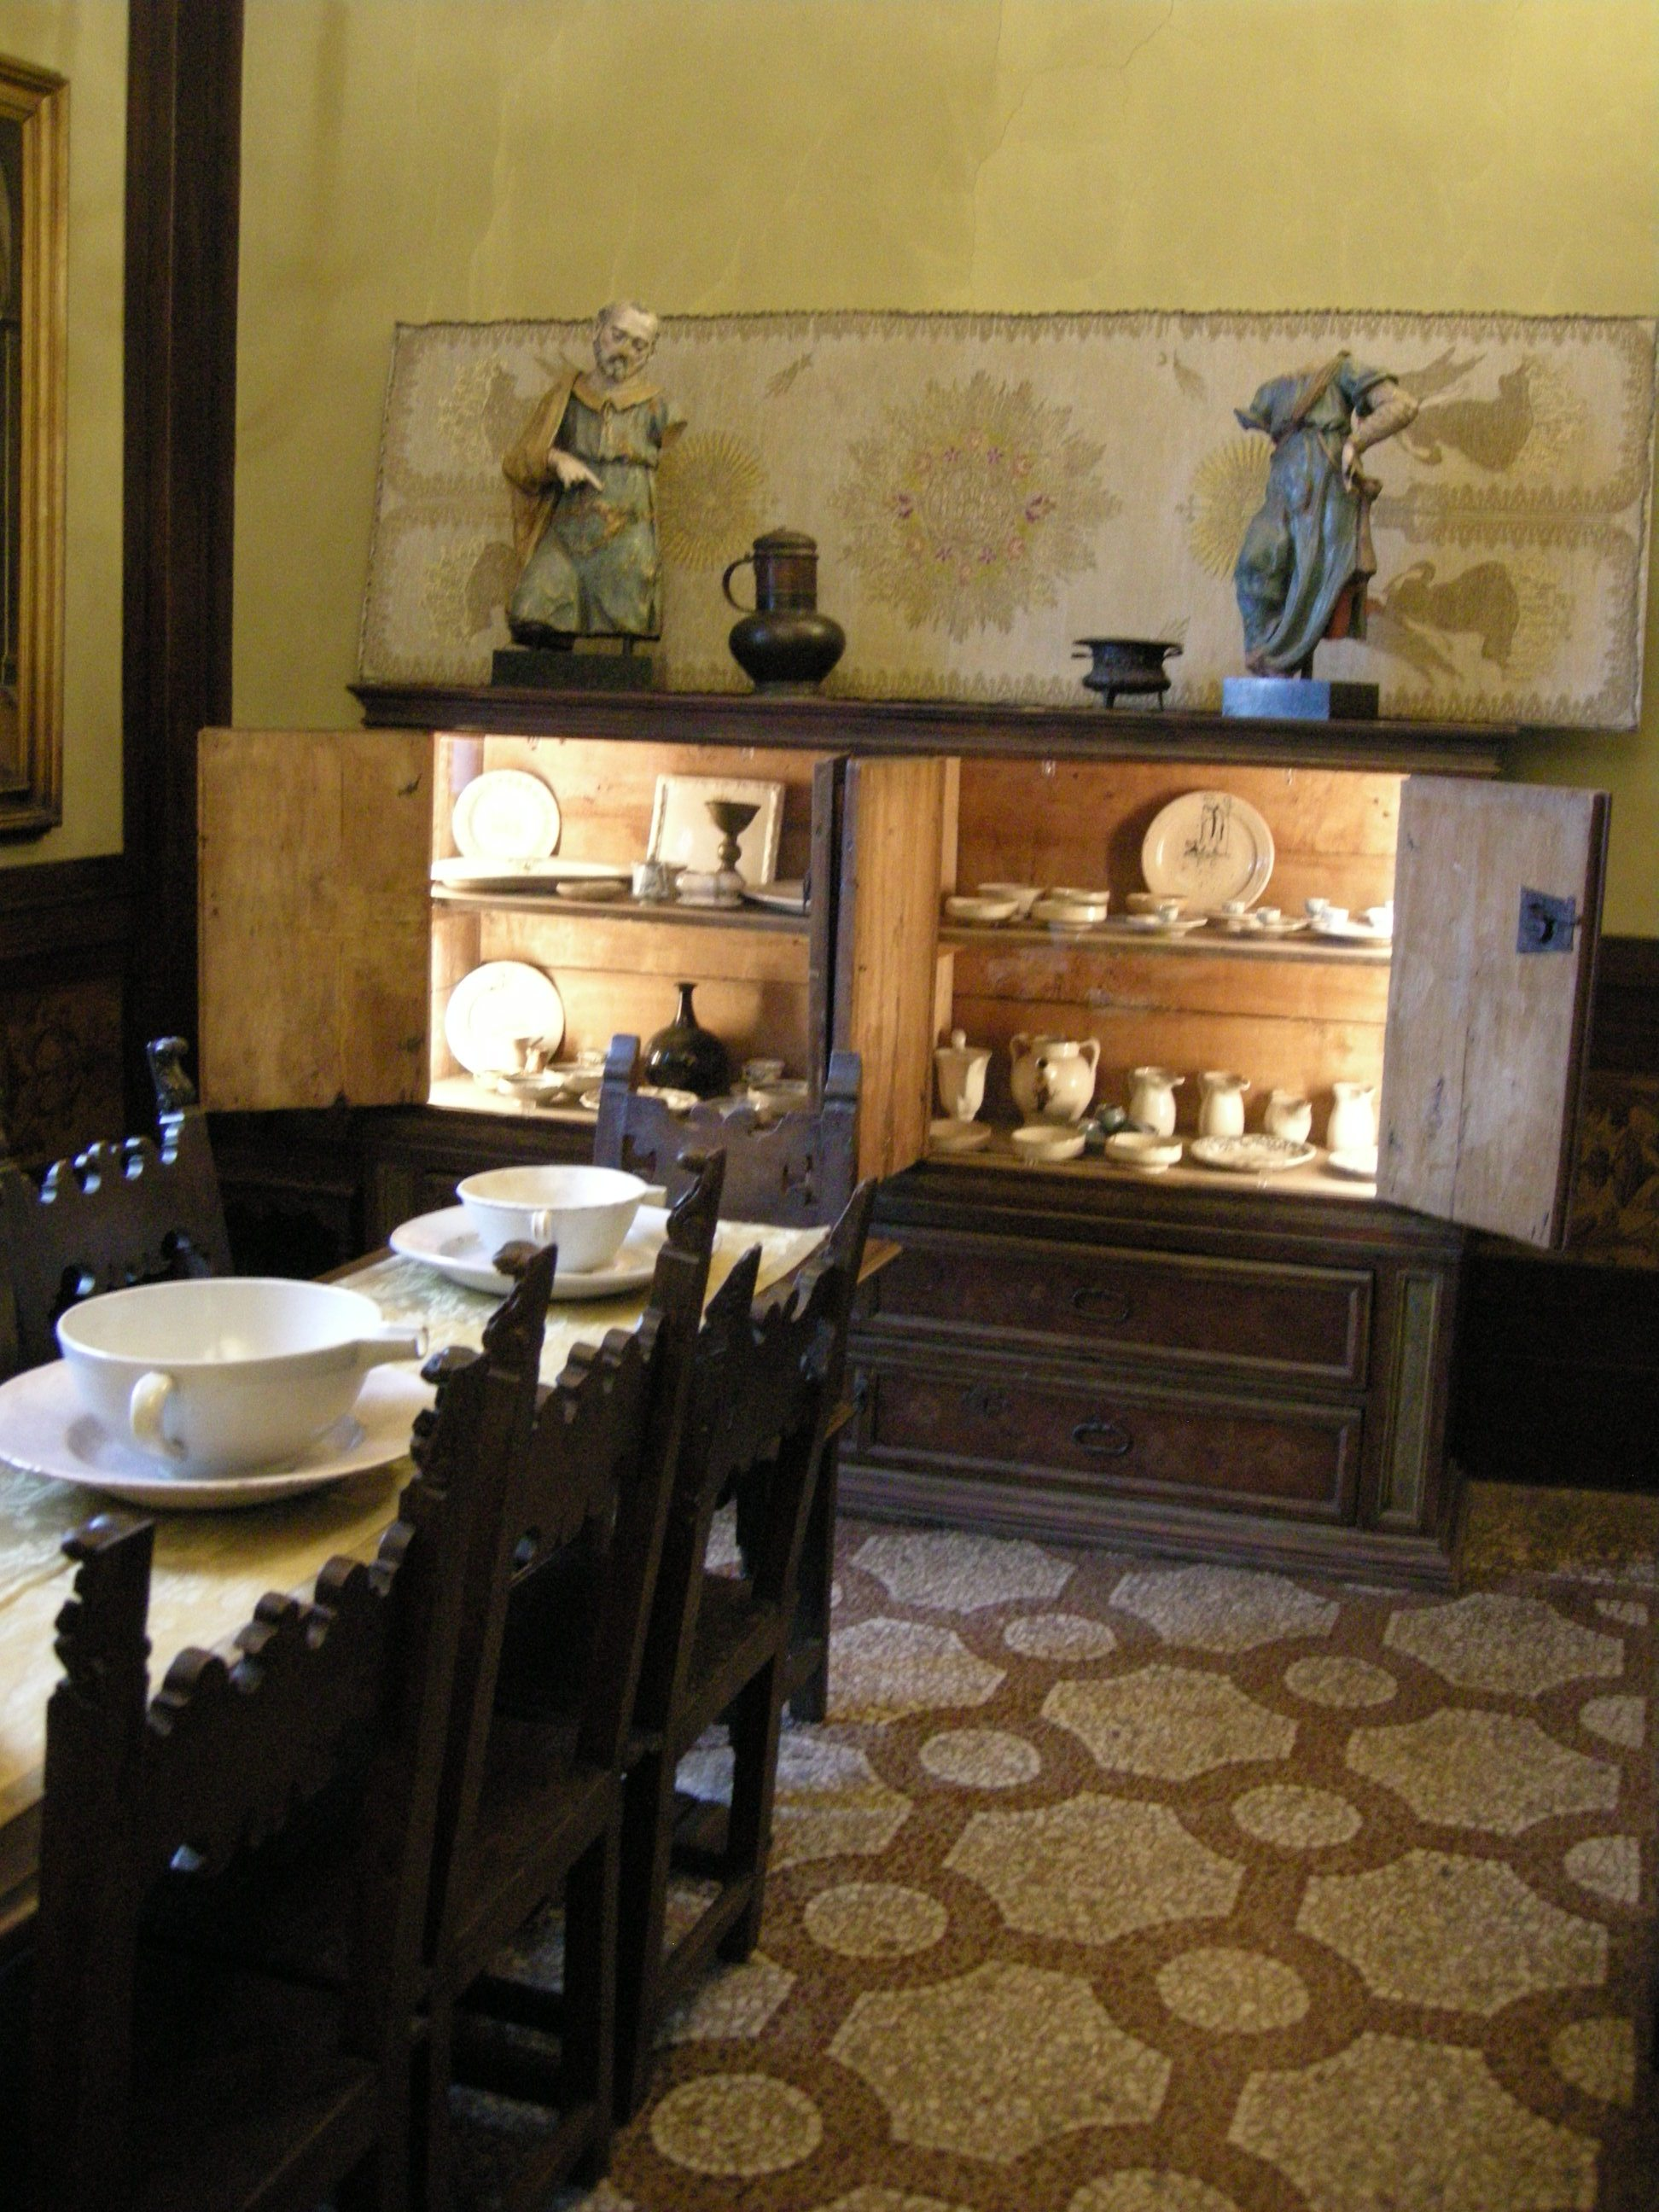 File:Casa Siviero Sala Da Pranzo 01.JPG Wikimedia Commons #977B34 1944 2592 Sala Da Pranzo Girevole Di Nerone